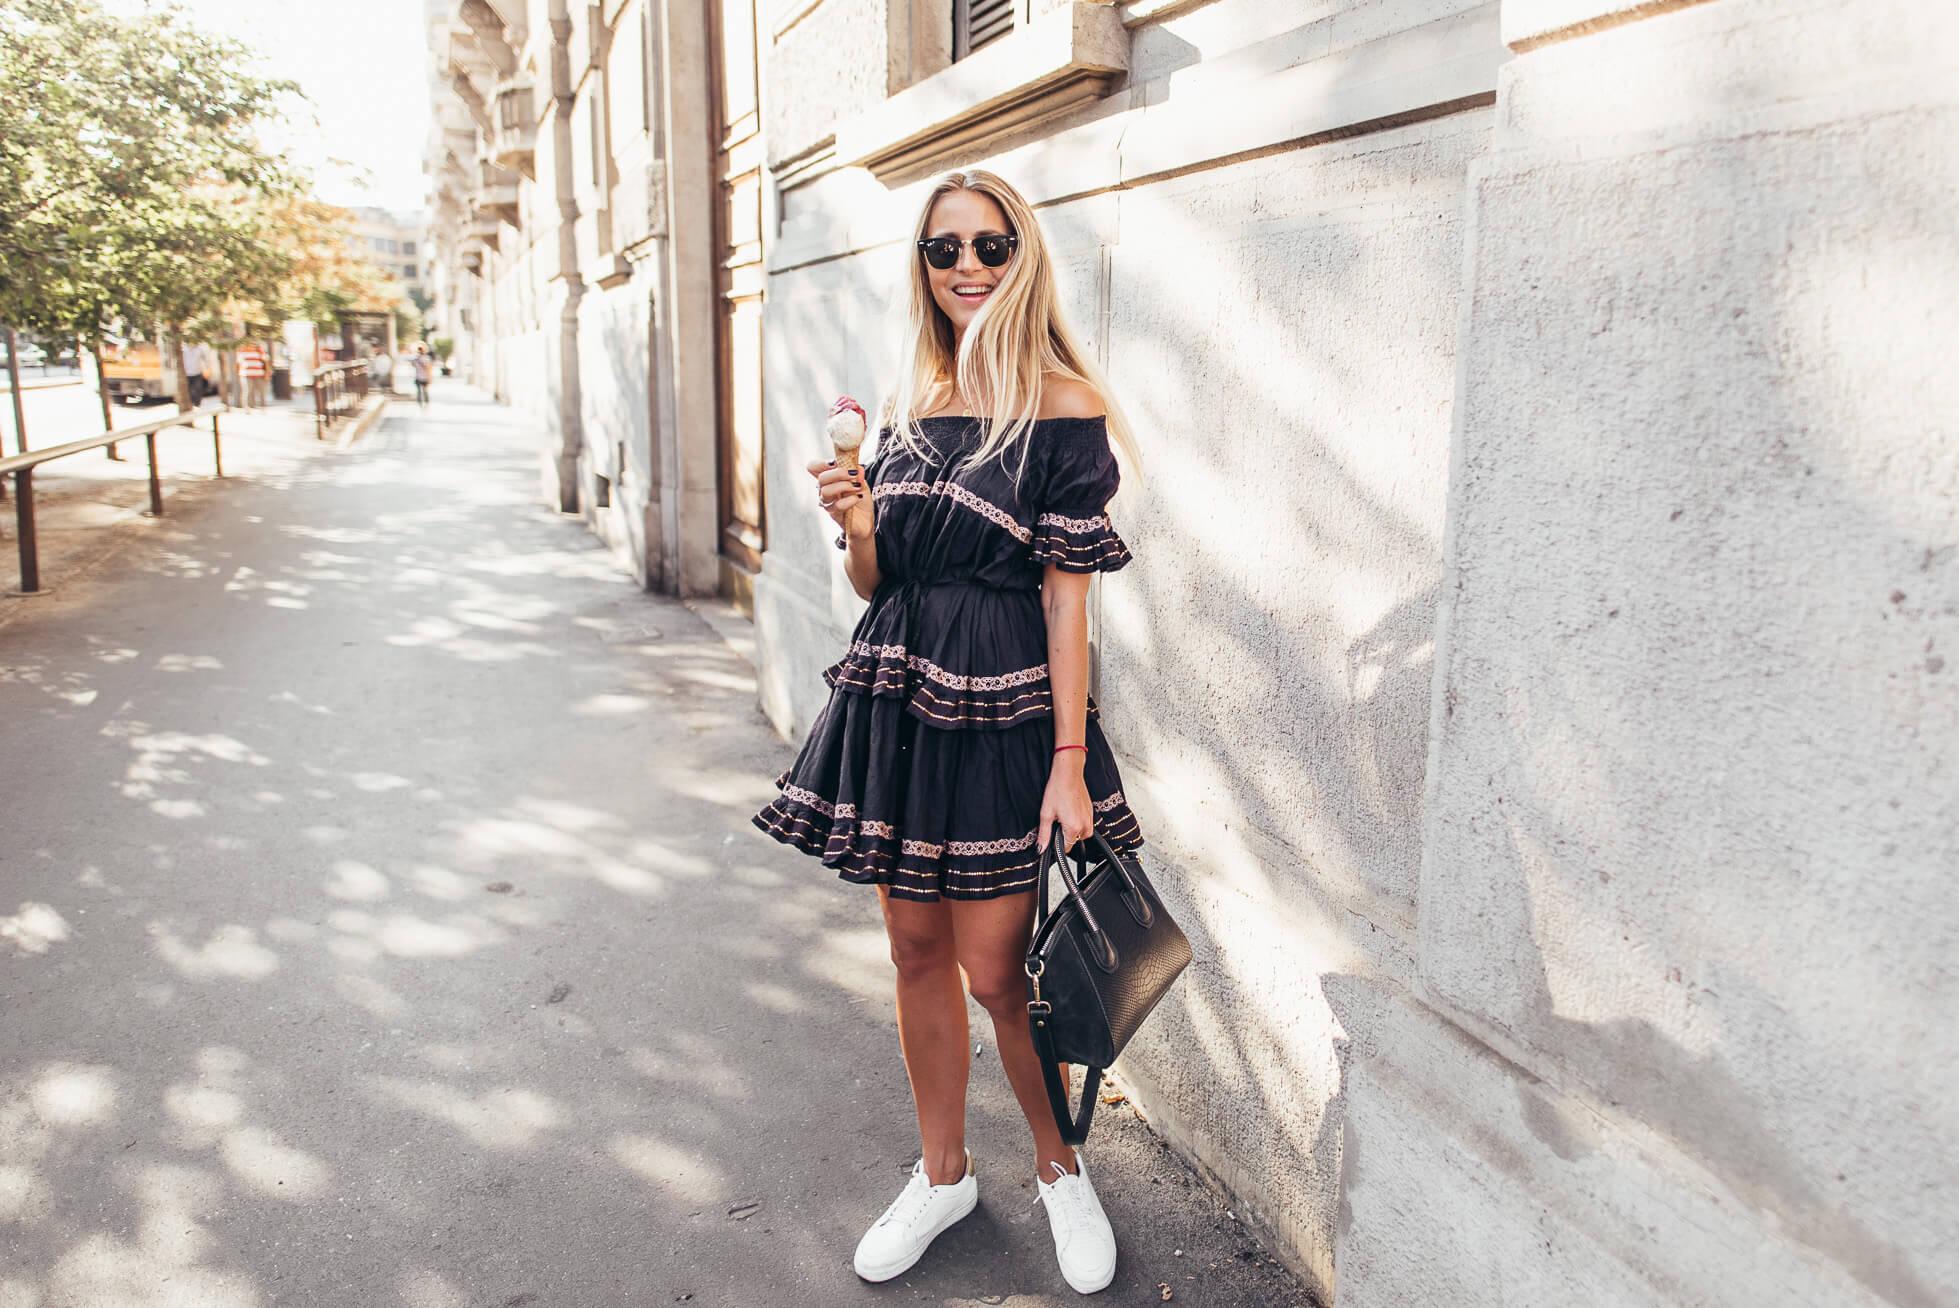 janni-deler-gelato-dress-milanDSC_1705